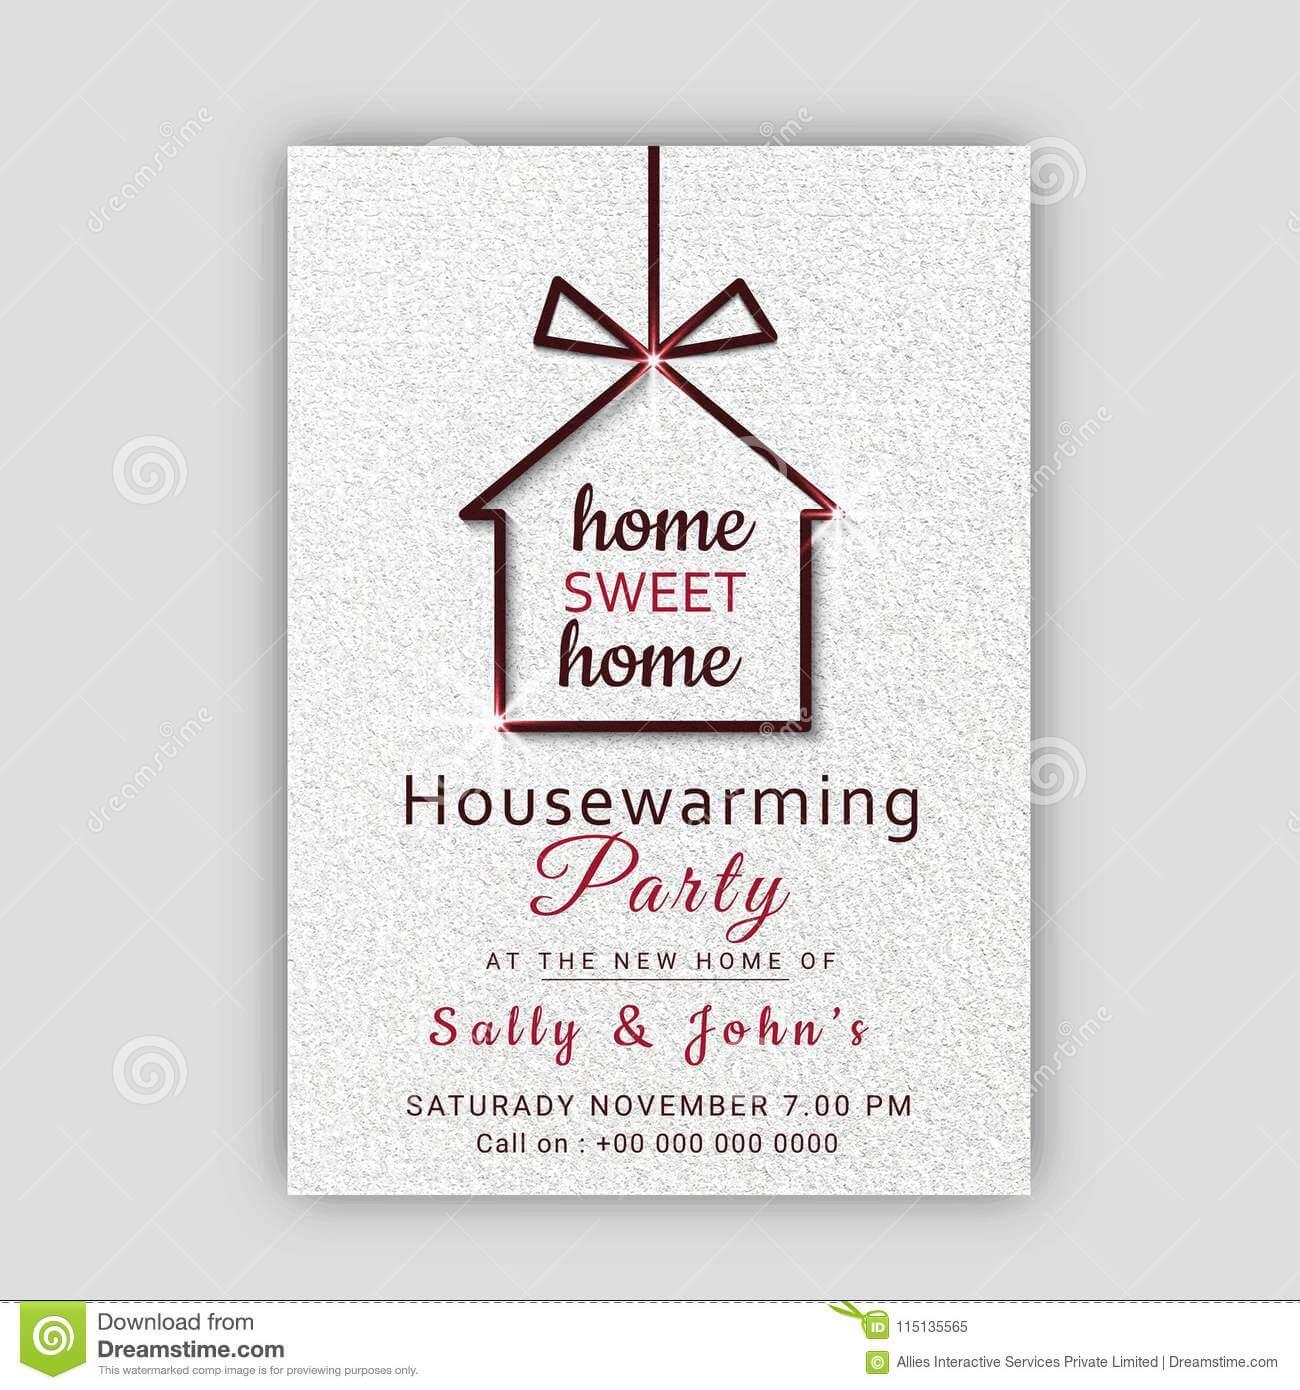 Housewarming Invitation Designs – Calep.midnightpig.co With Regard To Free Housewarming Invitation Card Template